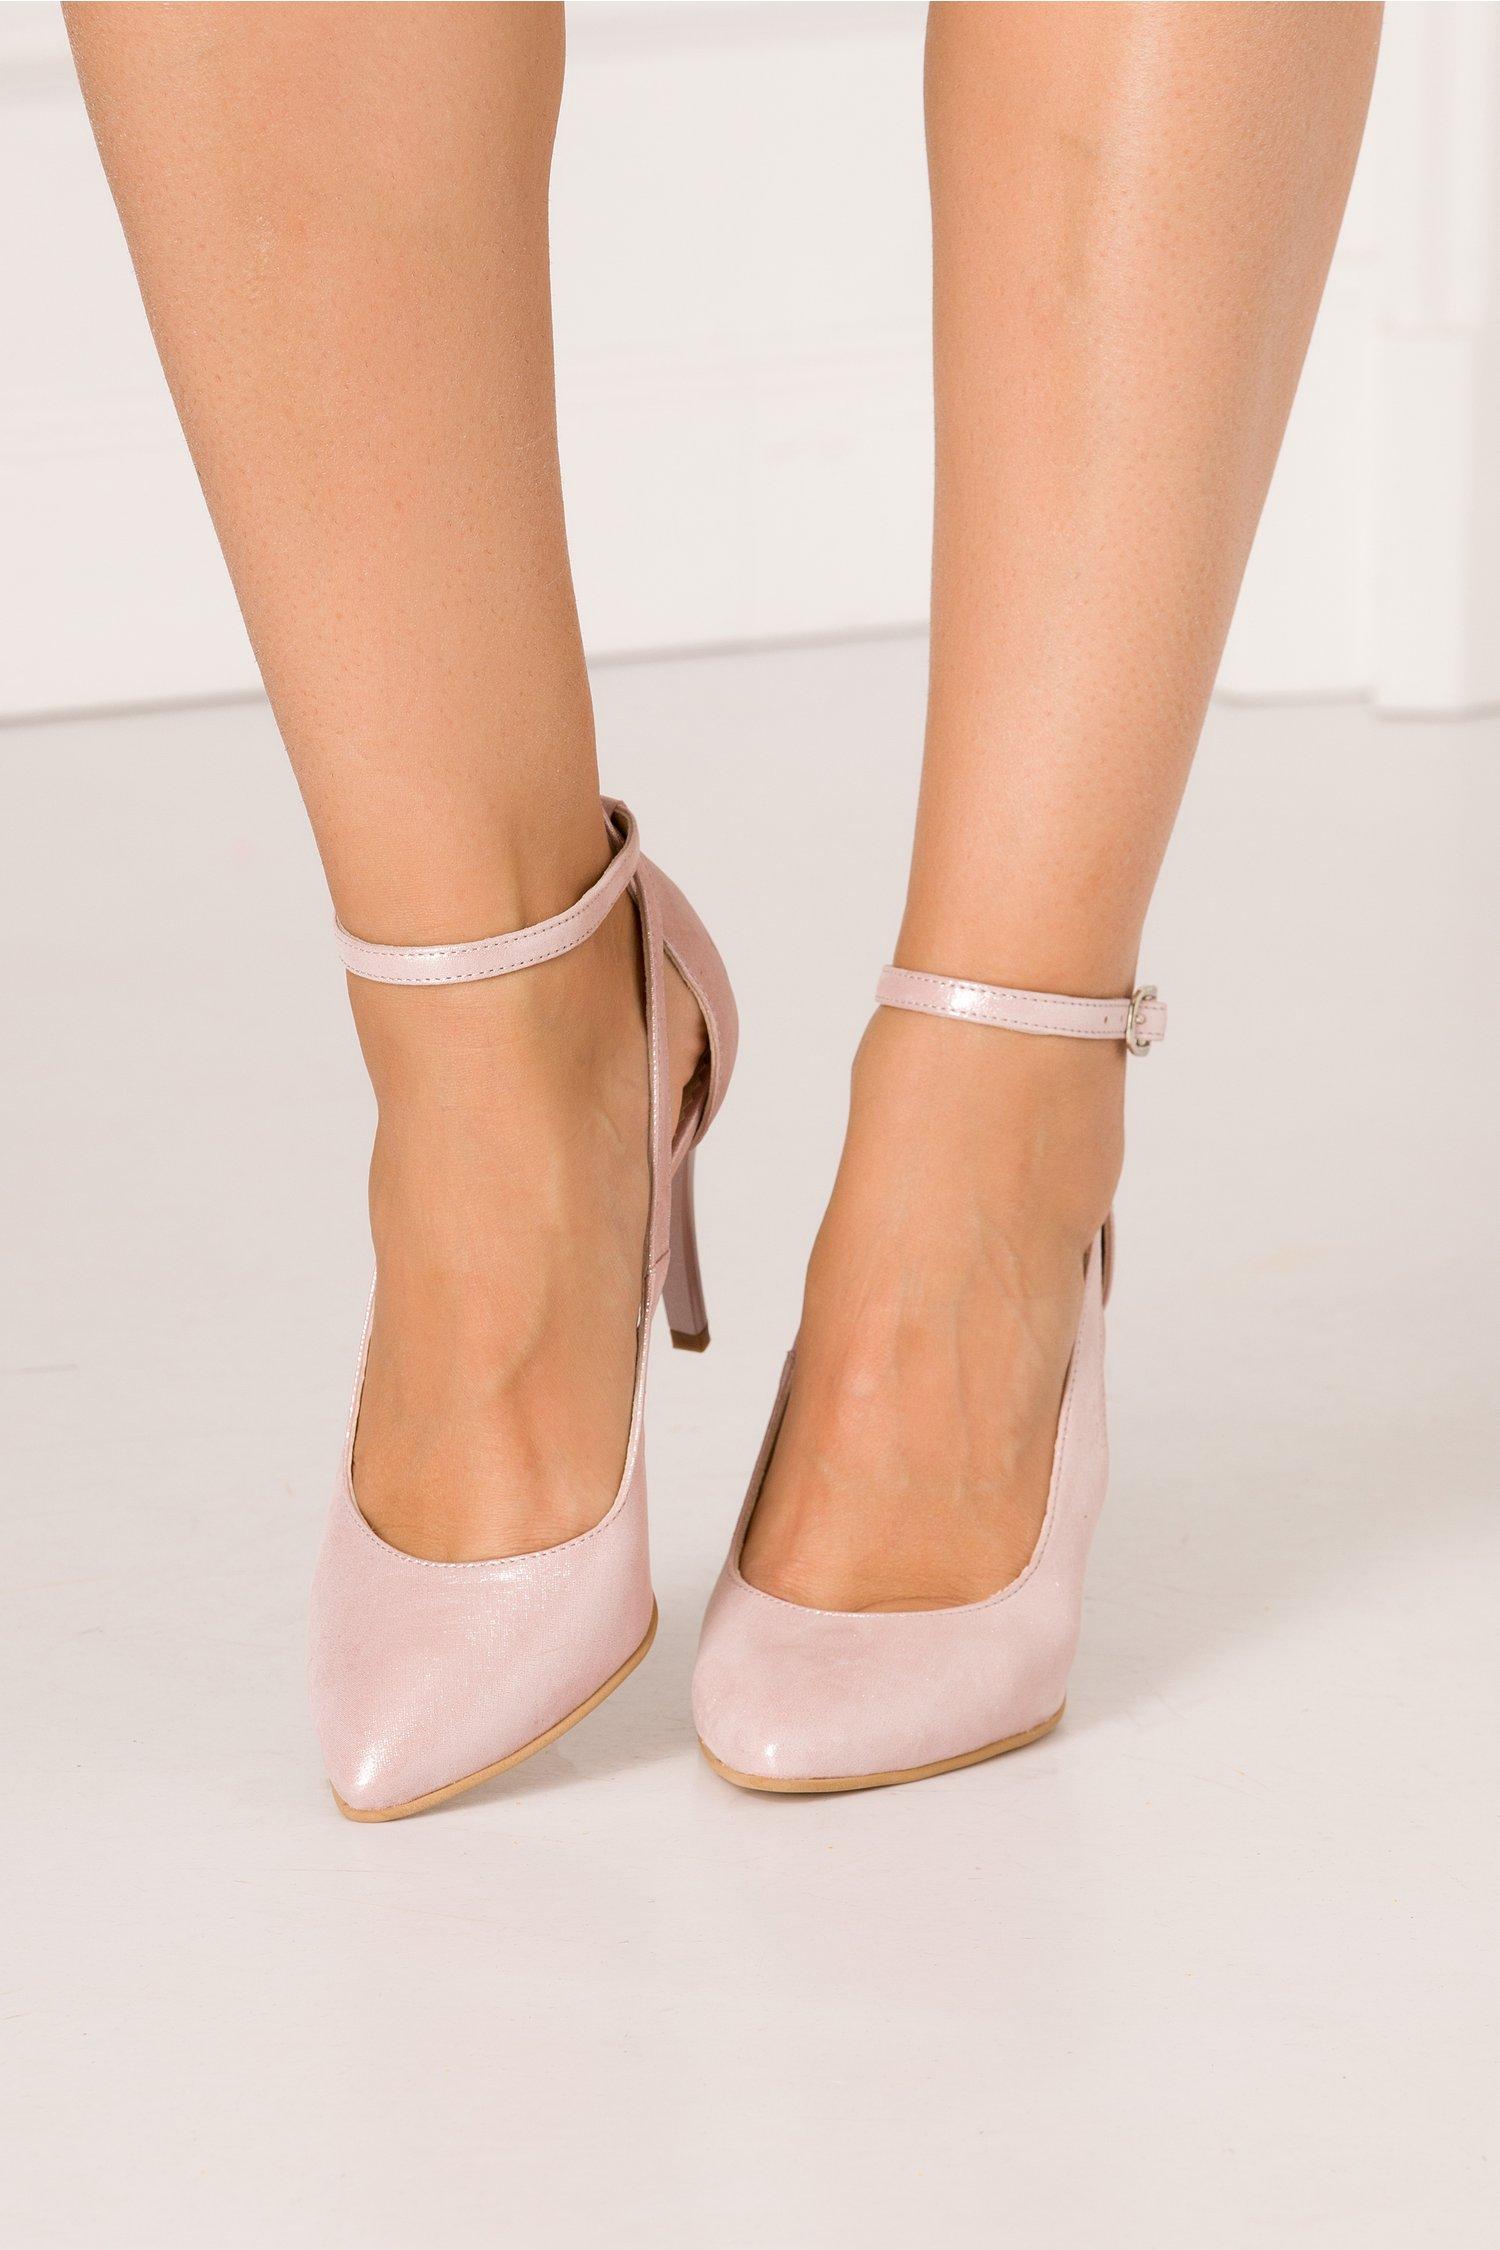 Pantofi decupati roz sidefat cu toc stiletto